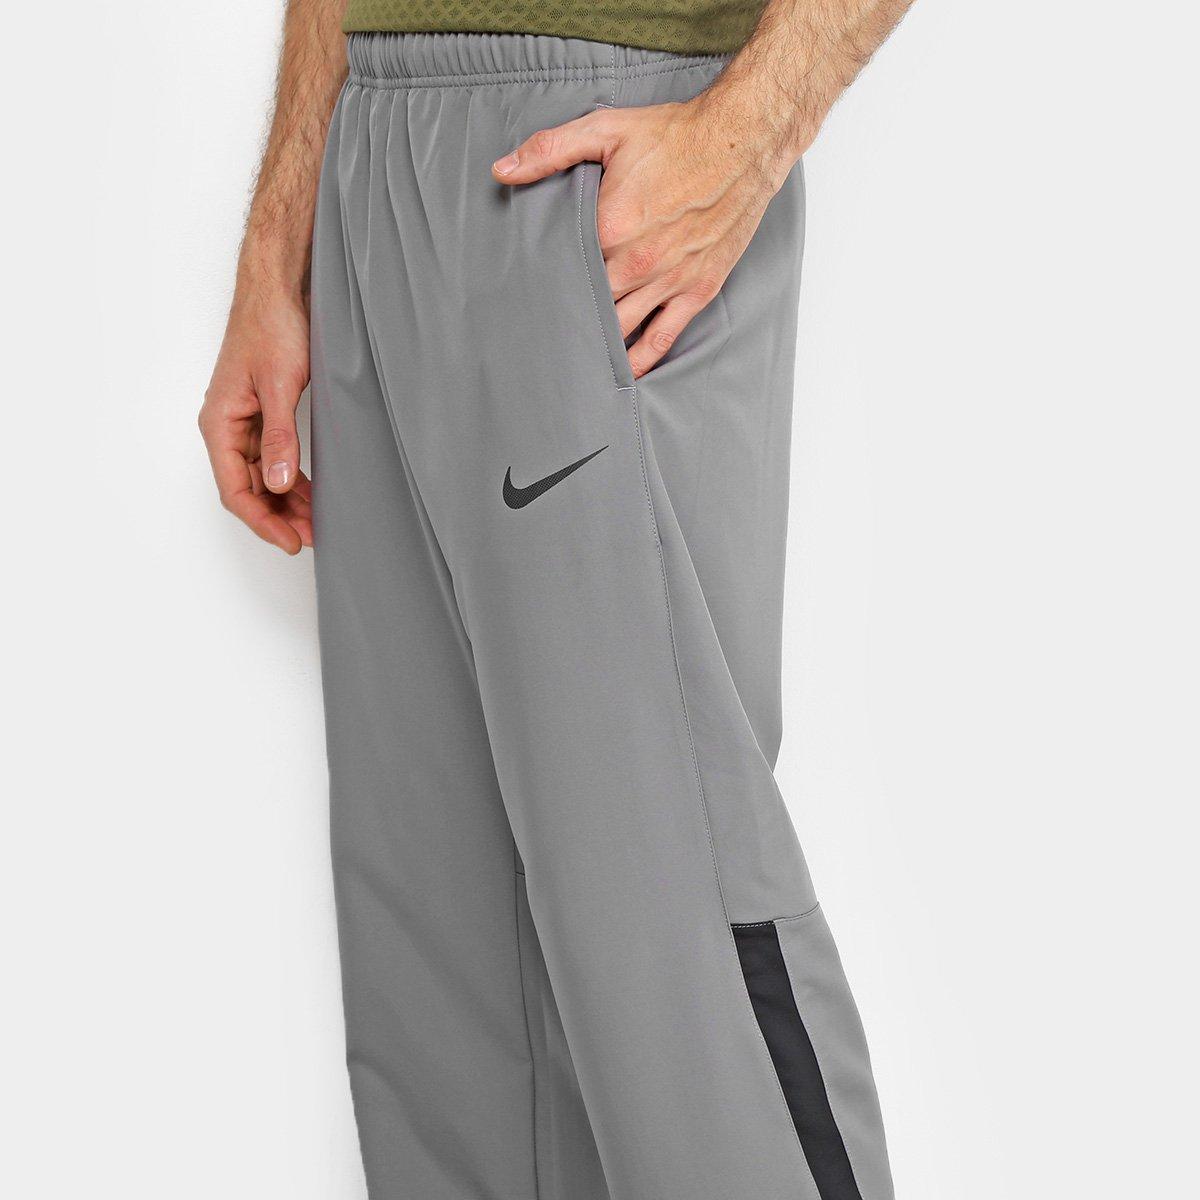 Calça Nike Dry Team Woven Masculina - Cinza e Preto - Compre Agora ... 0daa5094d527f